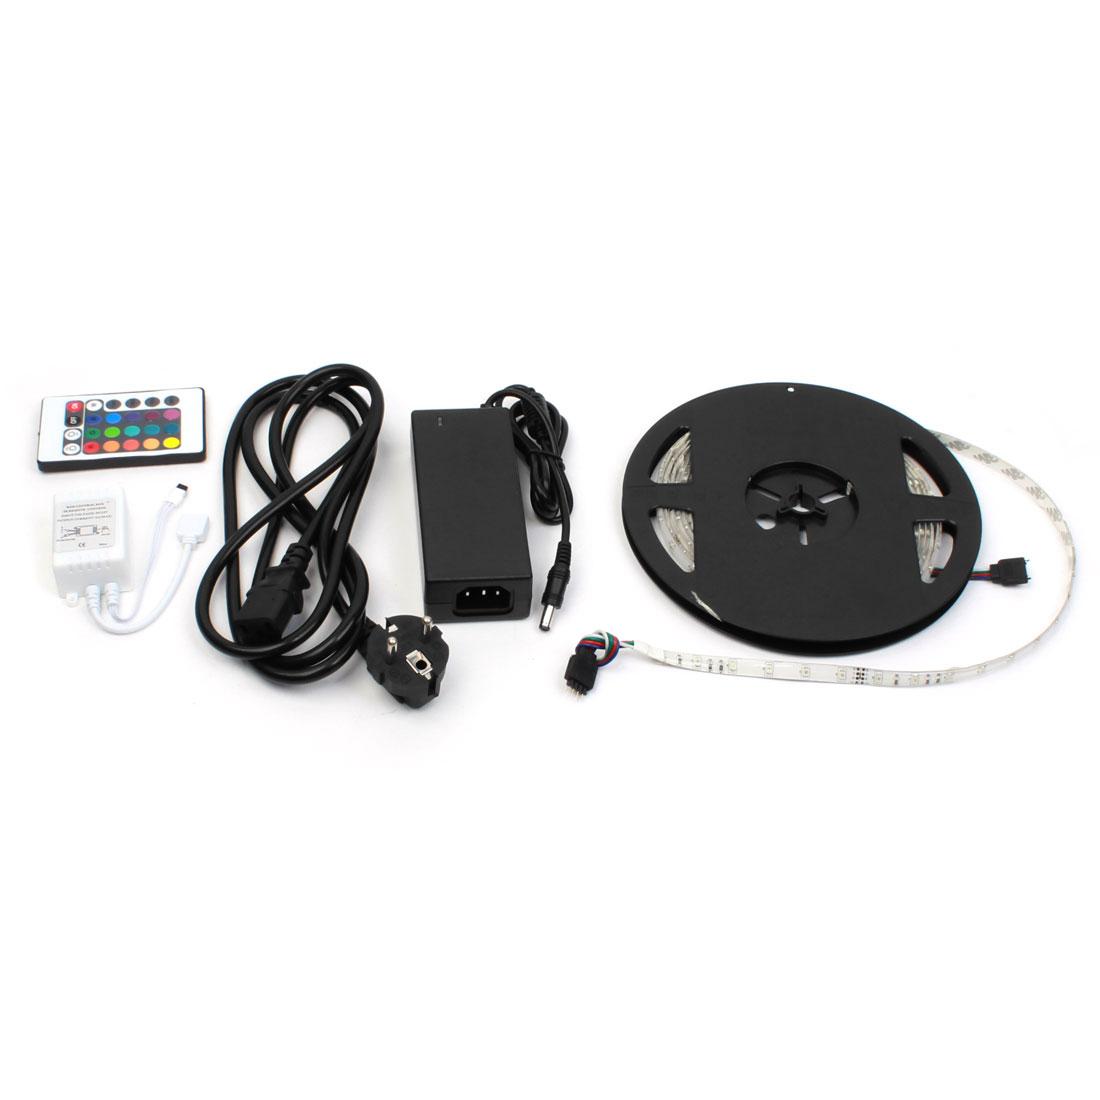 Car AC/DC UK Plug Power Adapter 3528 300 LED Strip Light 5M + 24 Key RGB Controller